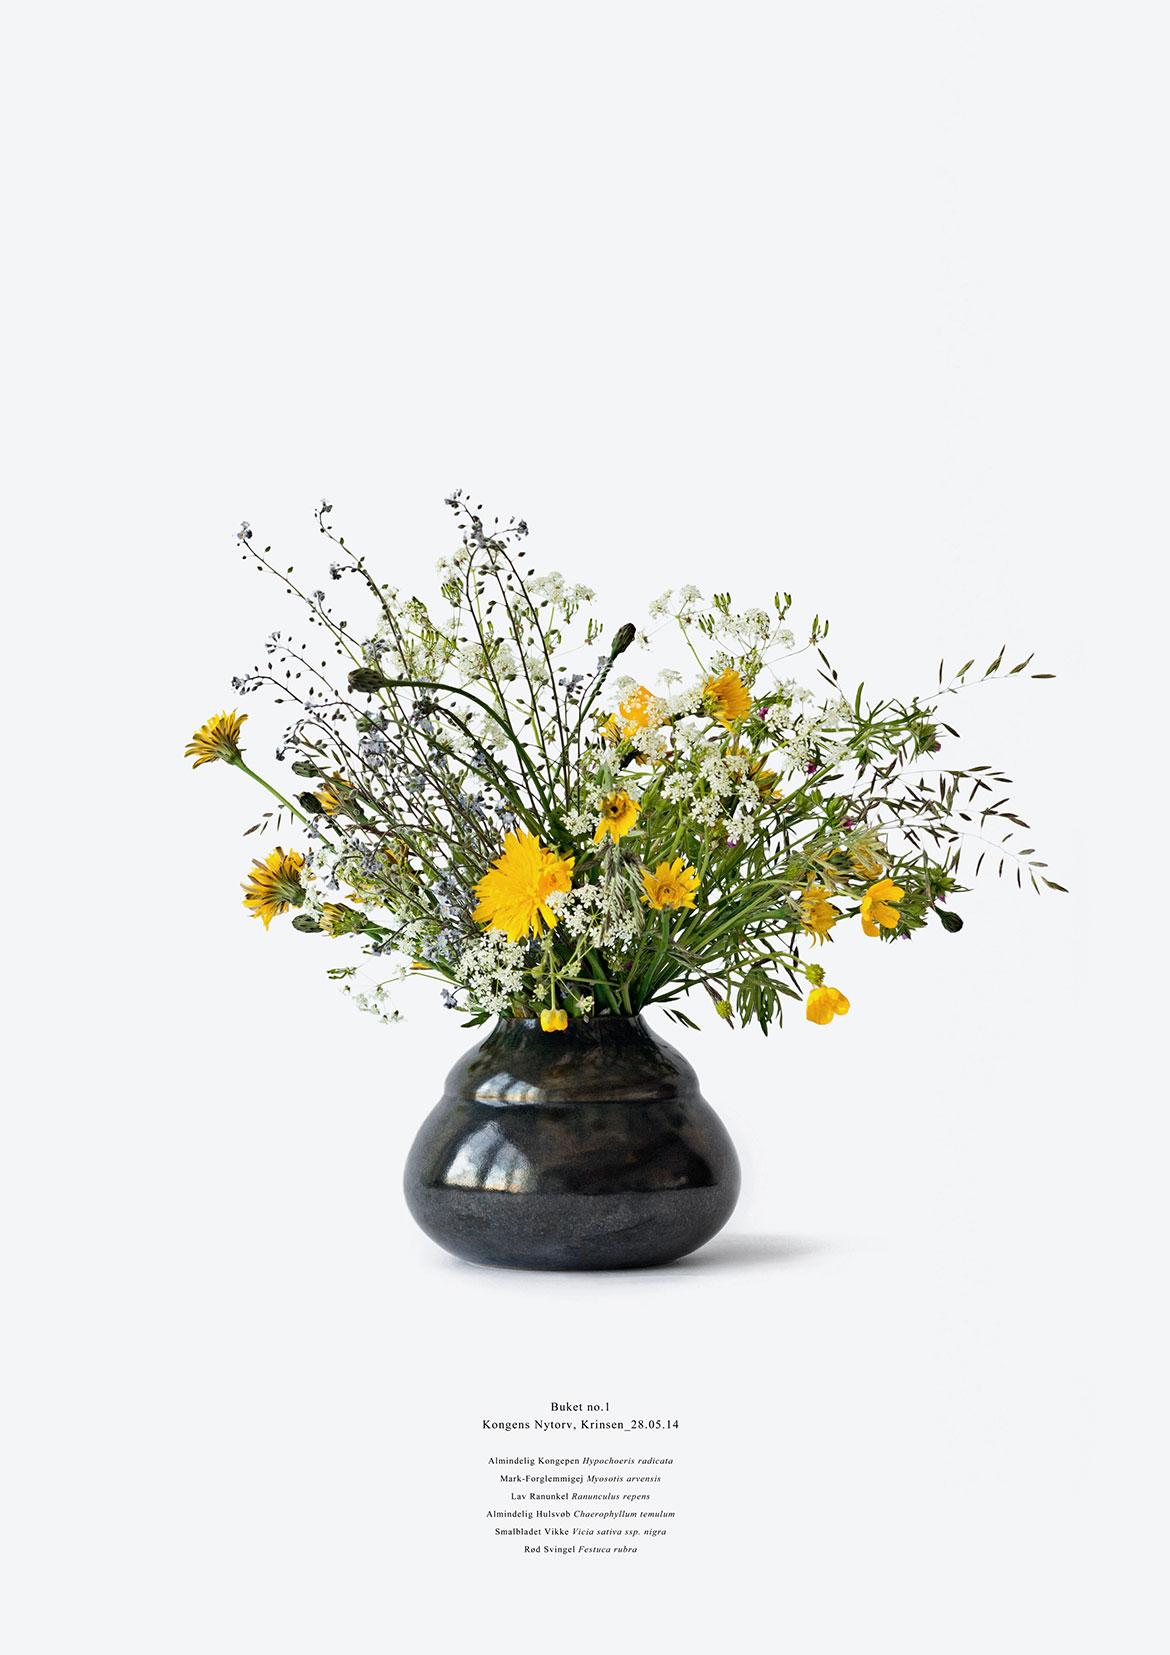 Camilla Berner, Planteindsamling #1 fra Krinsen, Kongens Nytorv, 2015